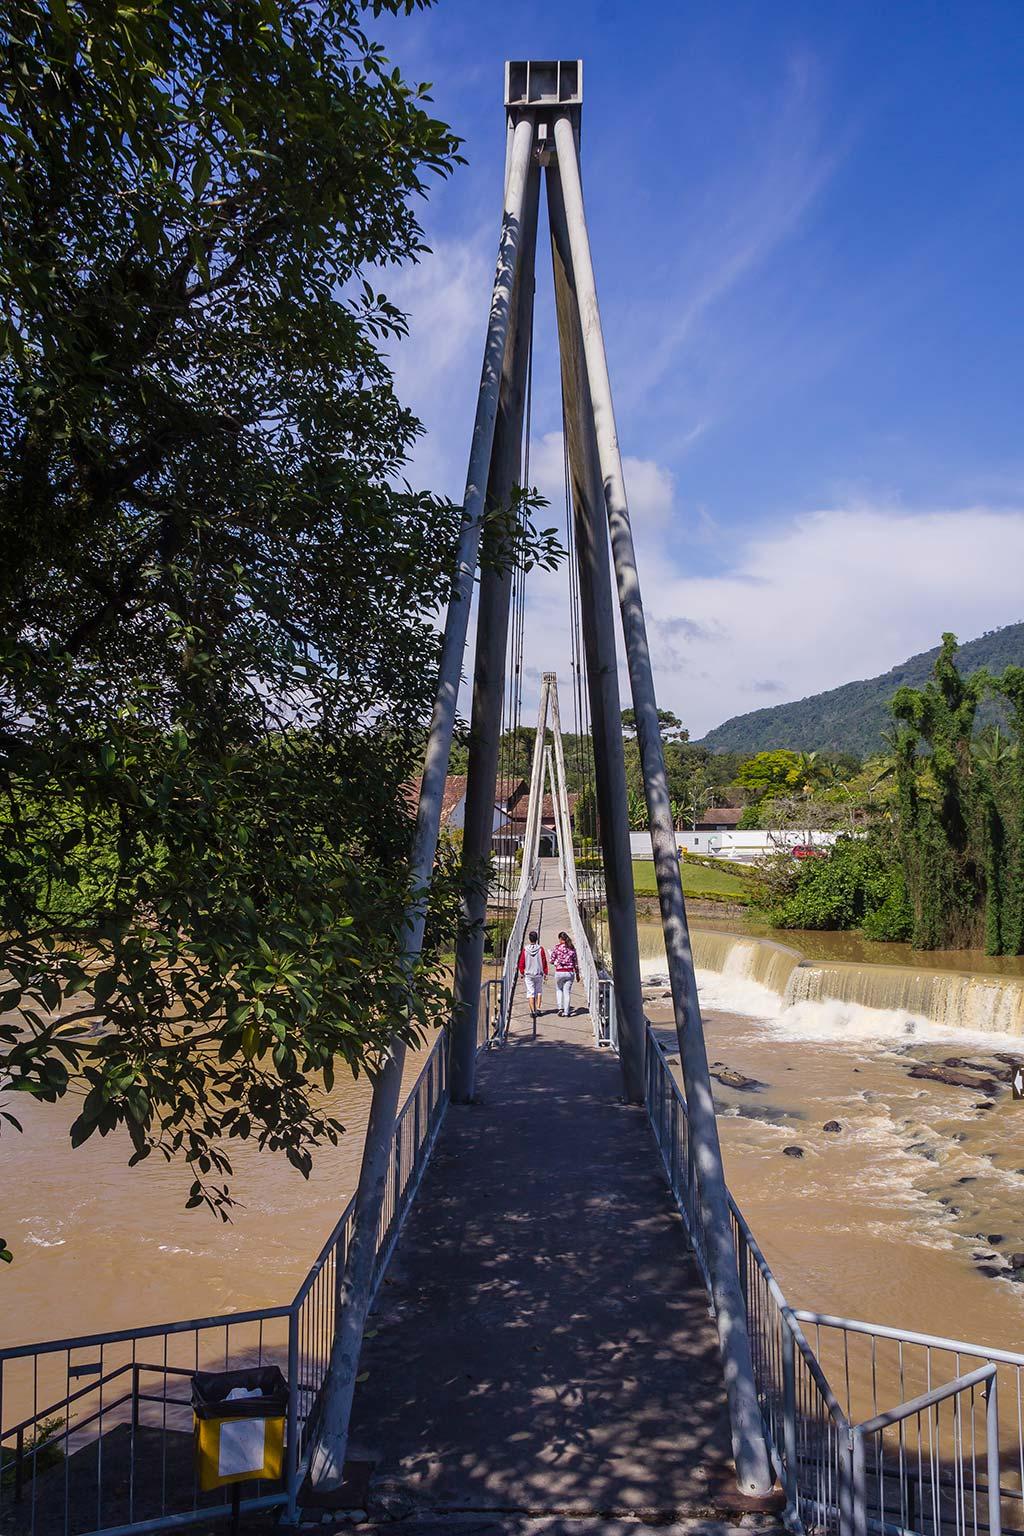 Circuito Vale Europeu - Dia 2 - Timbó - Ponte no centro 2 - Rio Benedito